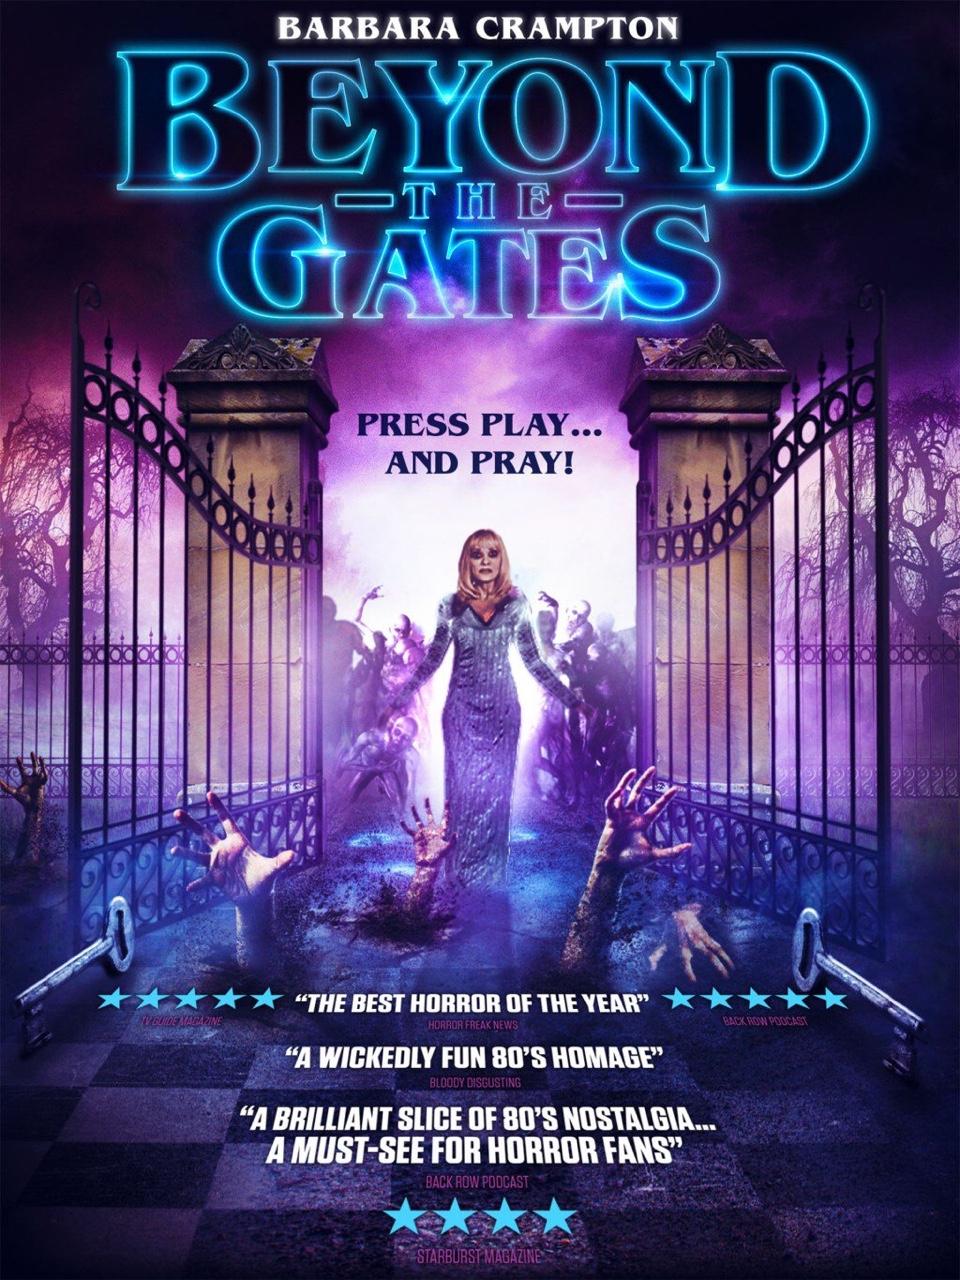 Beyond the Gates - DVD cover.jpg